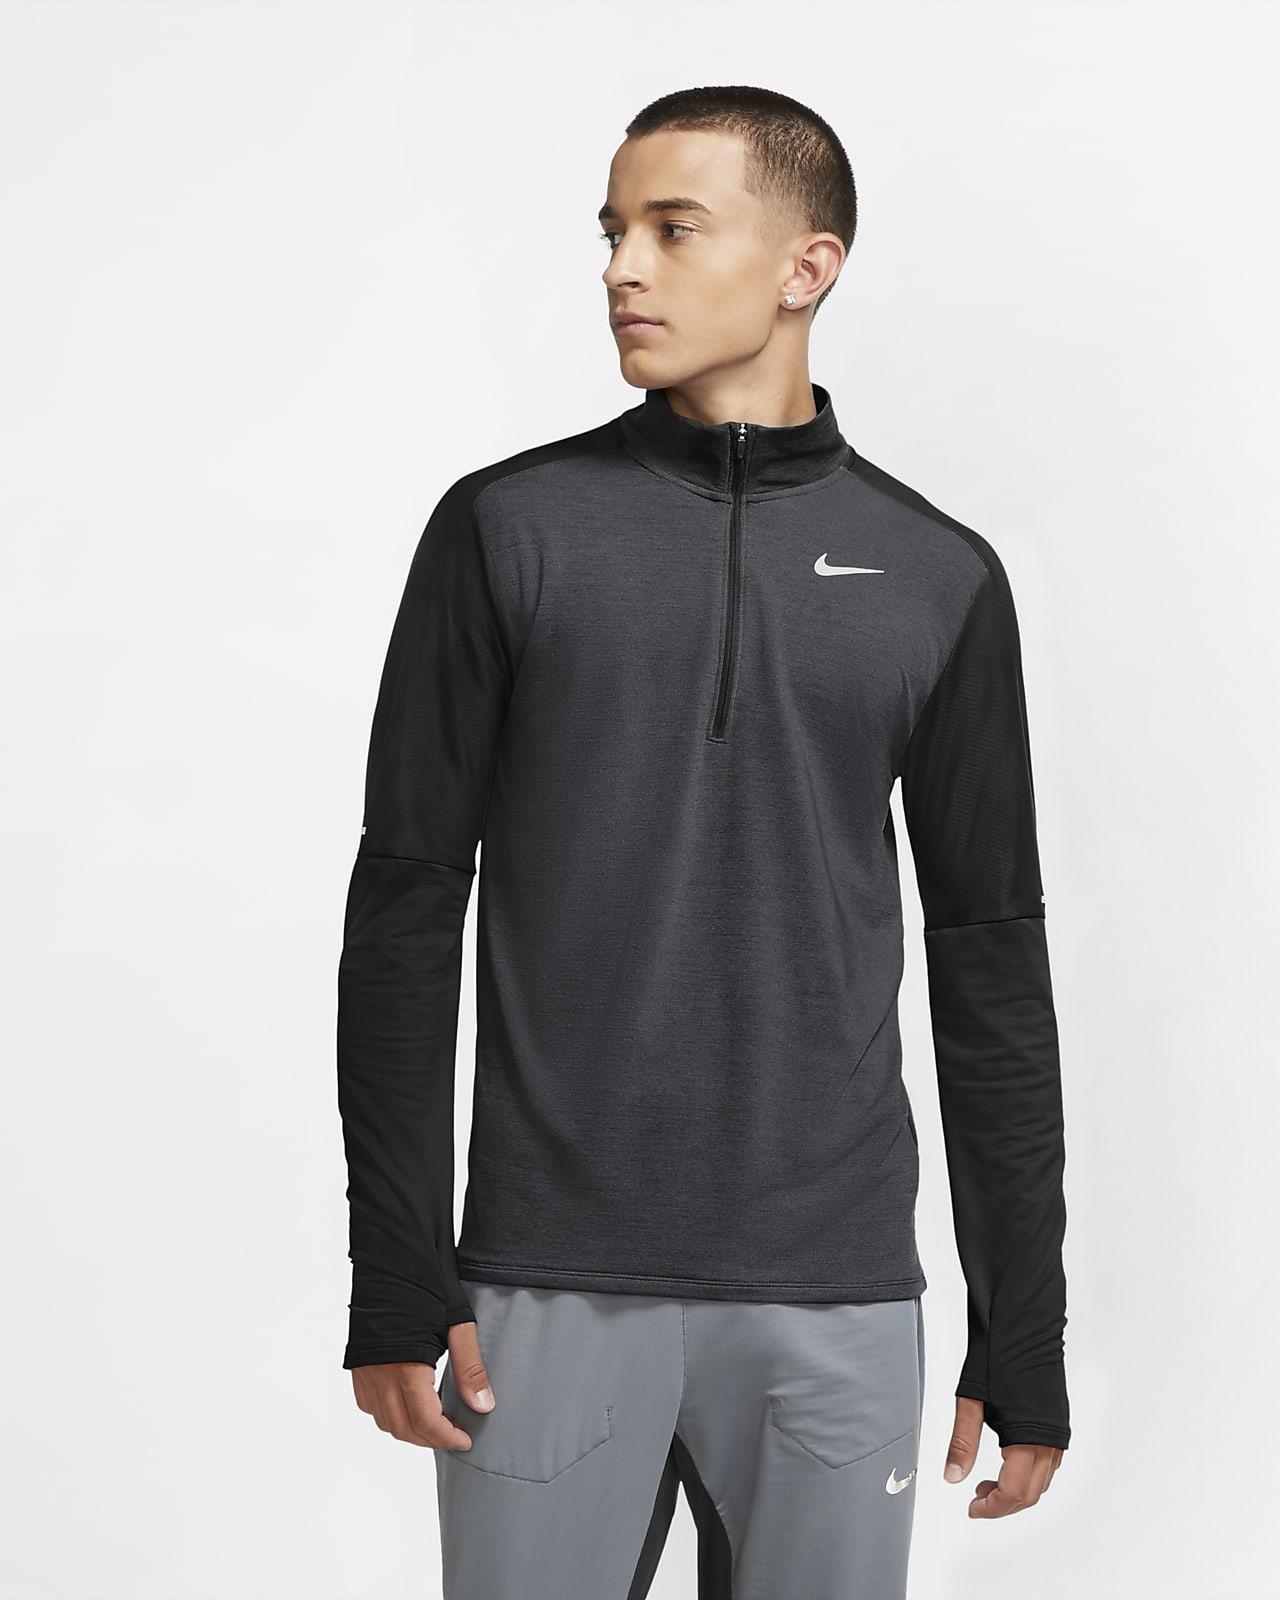 Nike Dri-FIT Men's 1/2-Zip Running Top